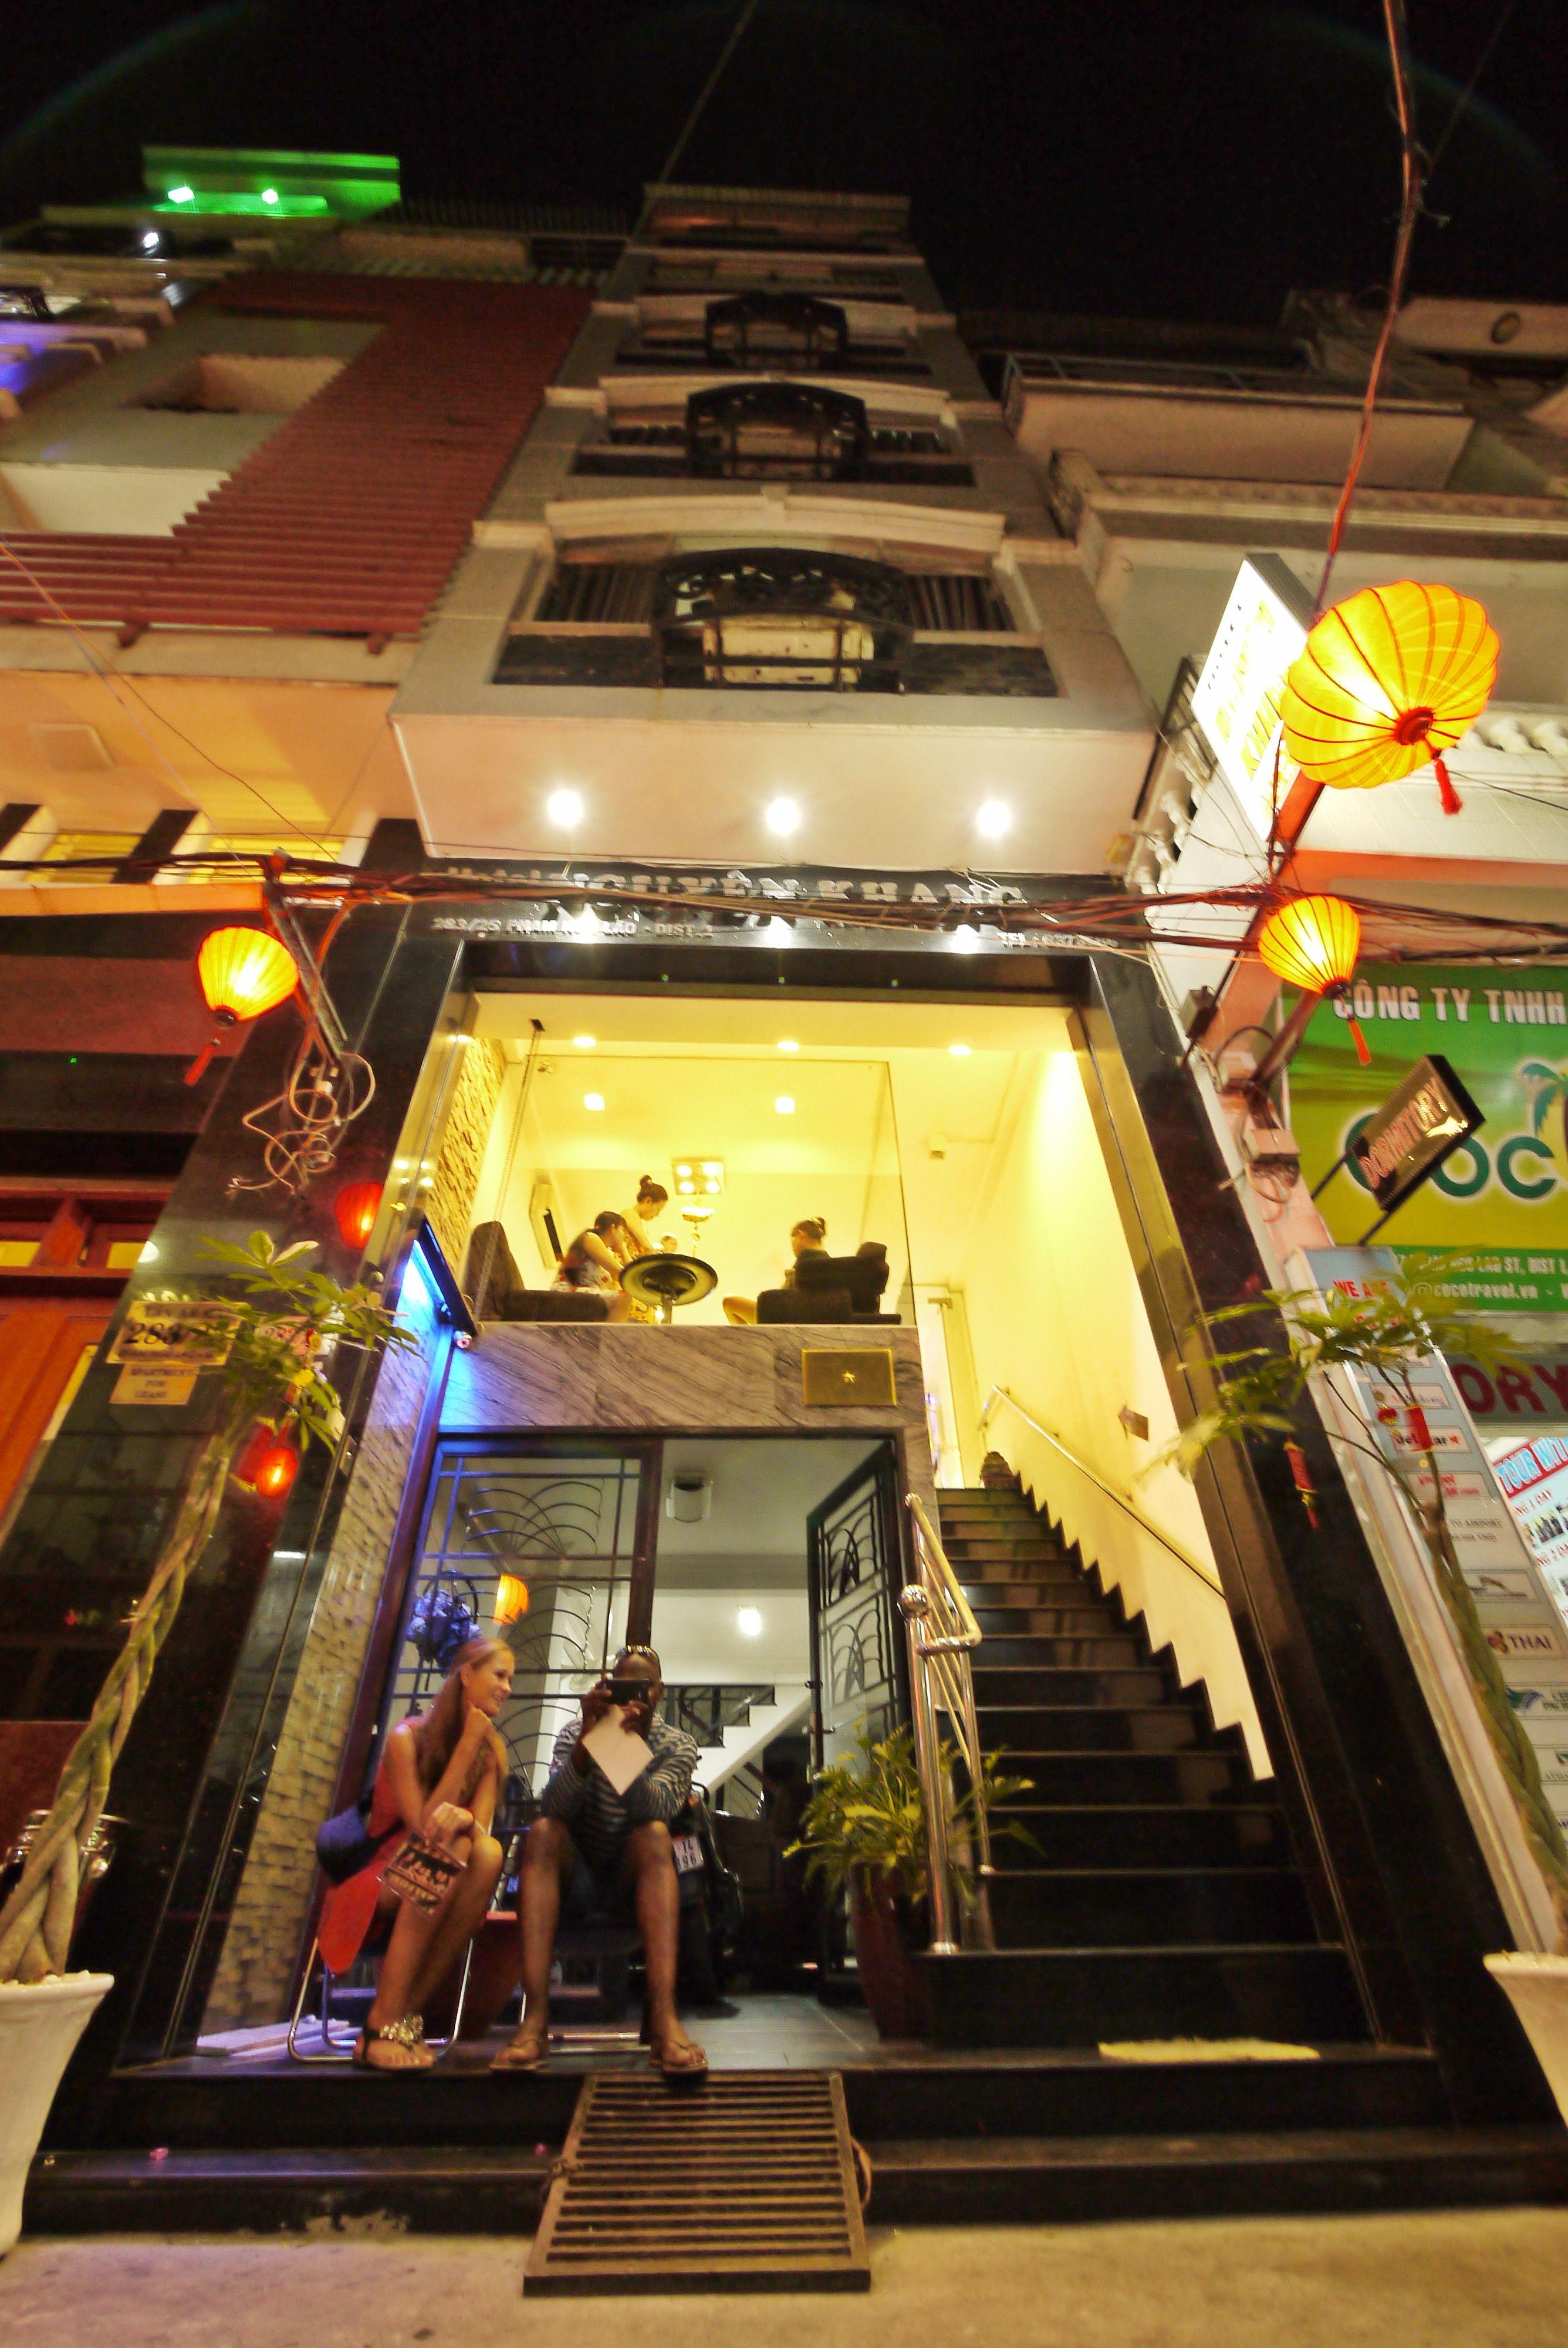 #Nguyen_Khang_Hotel in #Ho_Chi_Minh - #Vietnam http://directrooms.com/vietnam/hotel/nguyen-khang-hotel-ho-chi-minh-103328.htm